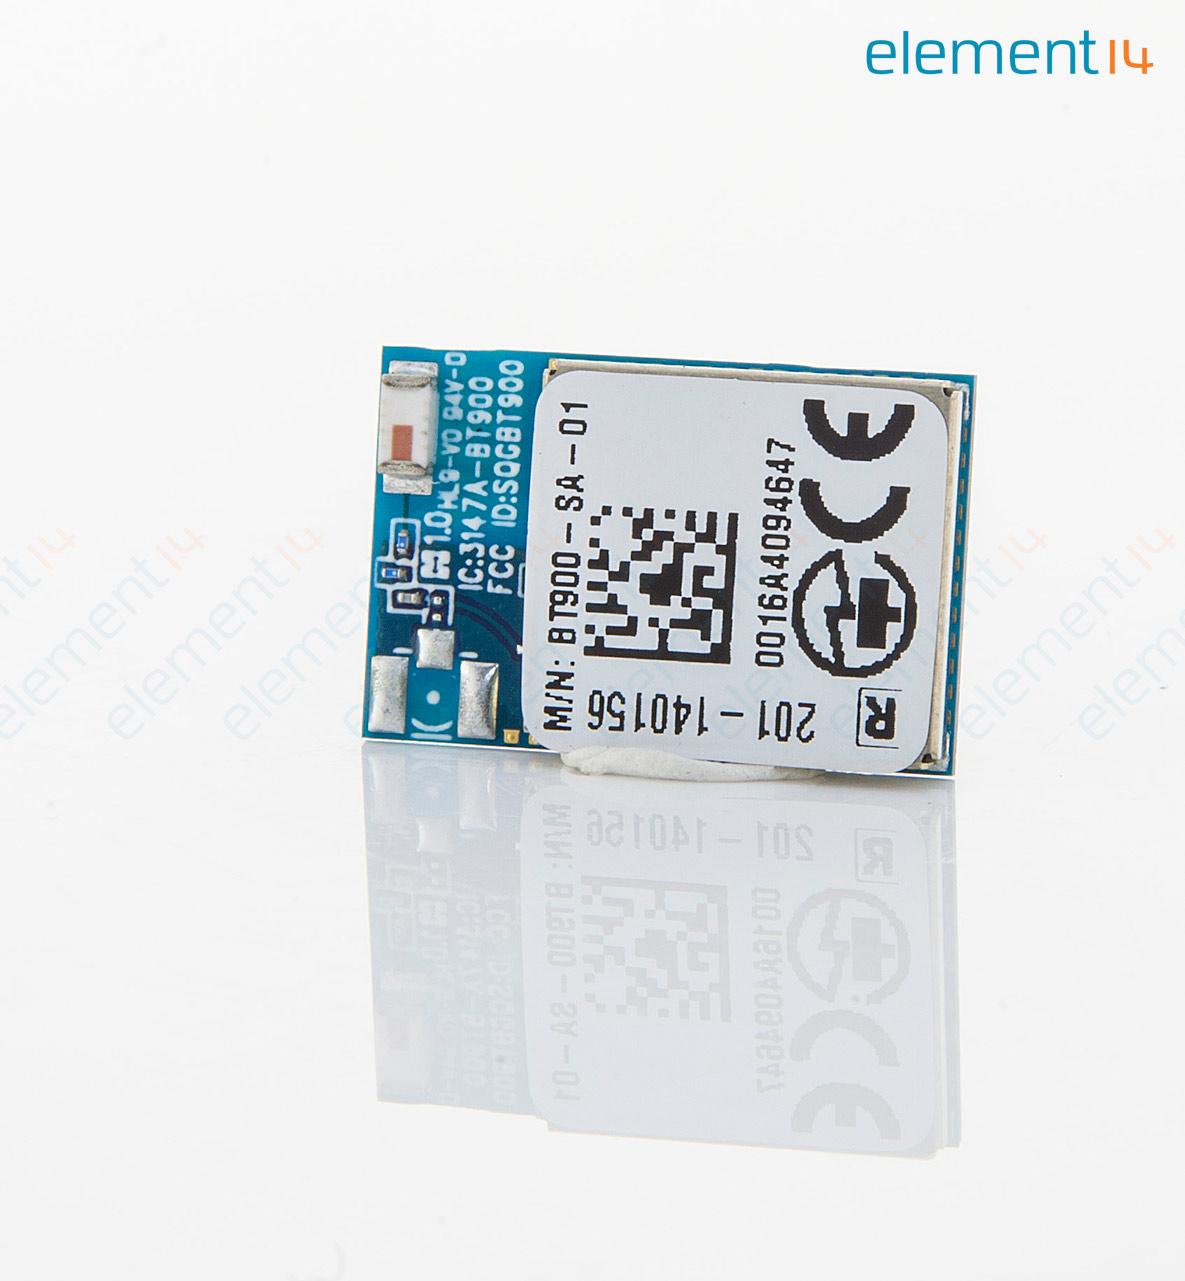 Intelligent Dual Mode Bluetooth® v4 0 Module, smartBASIC (Internal Antenna)